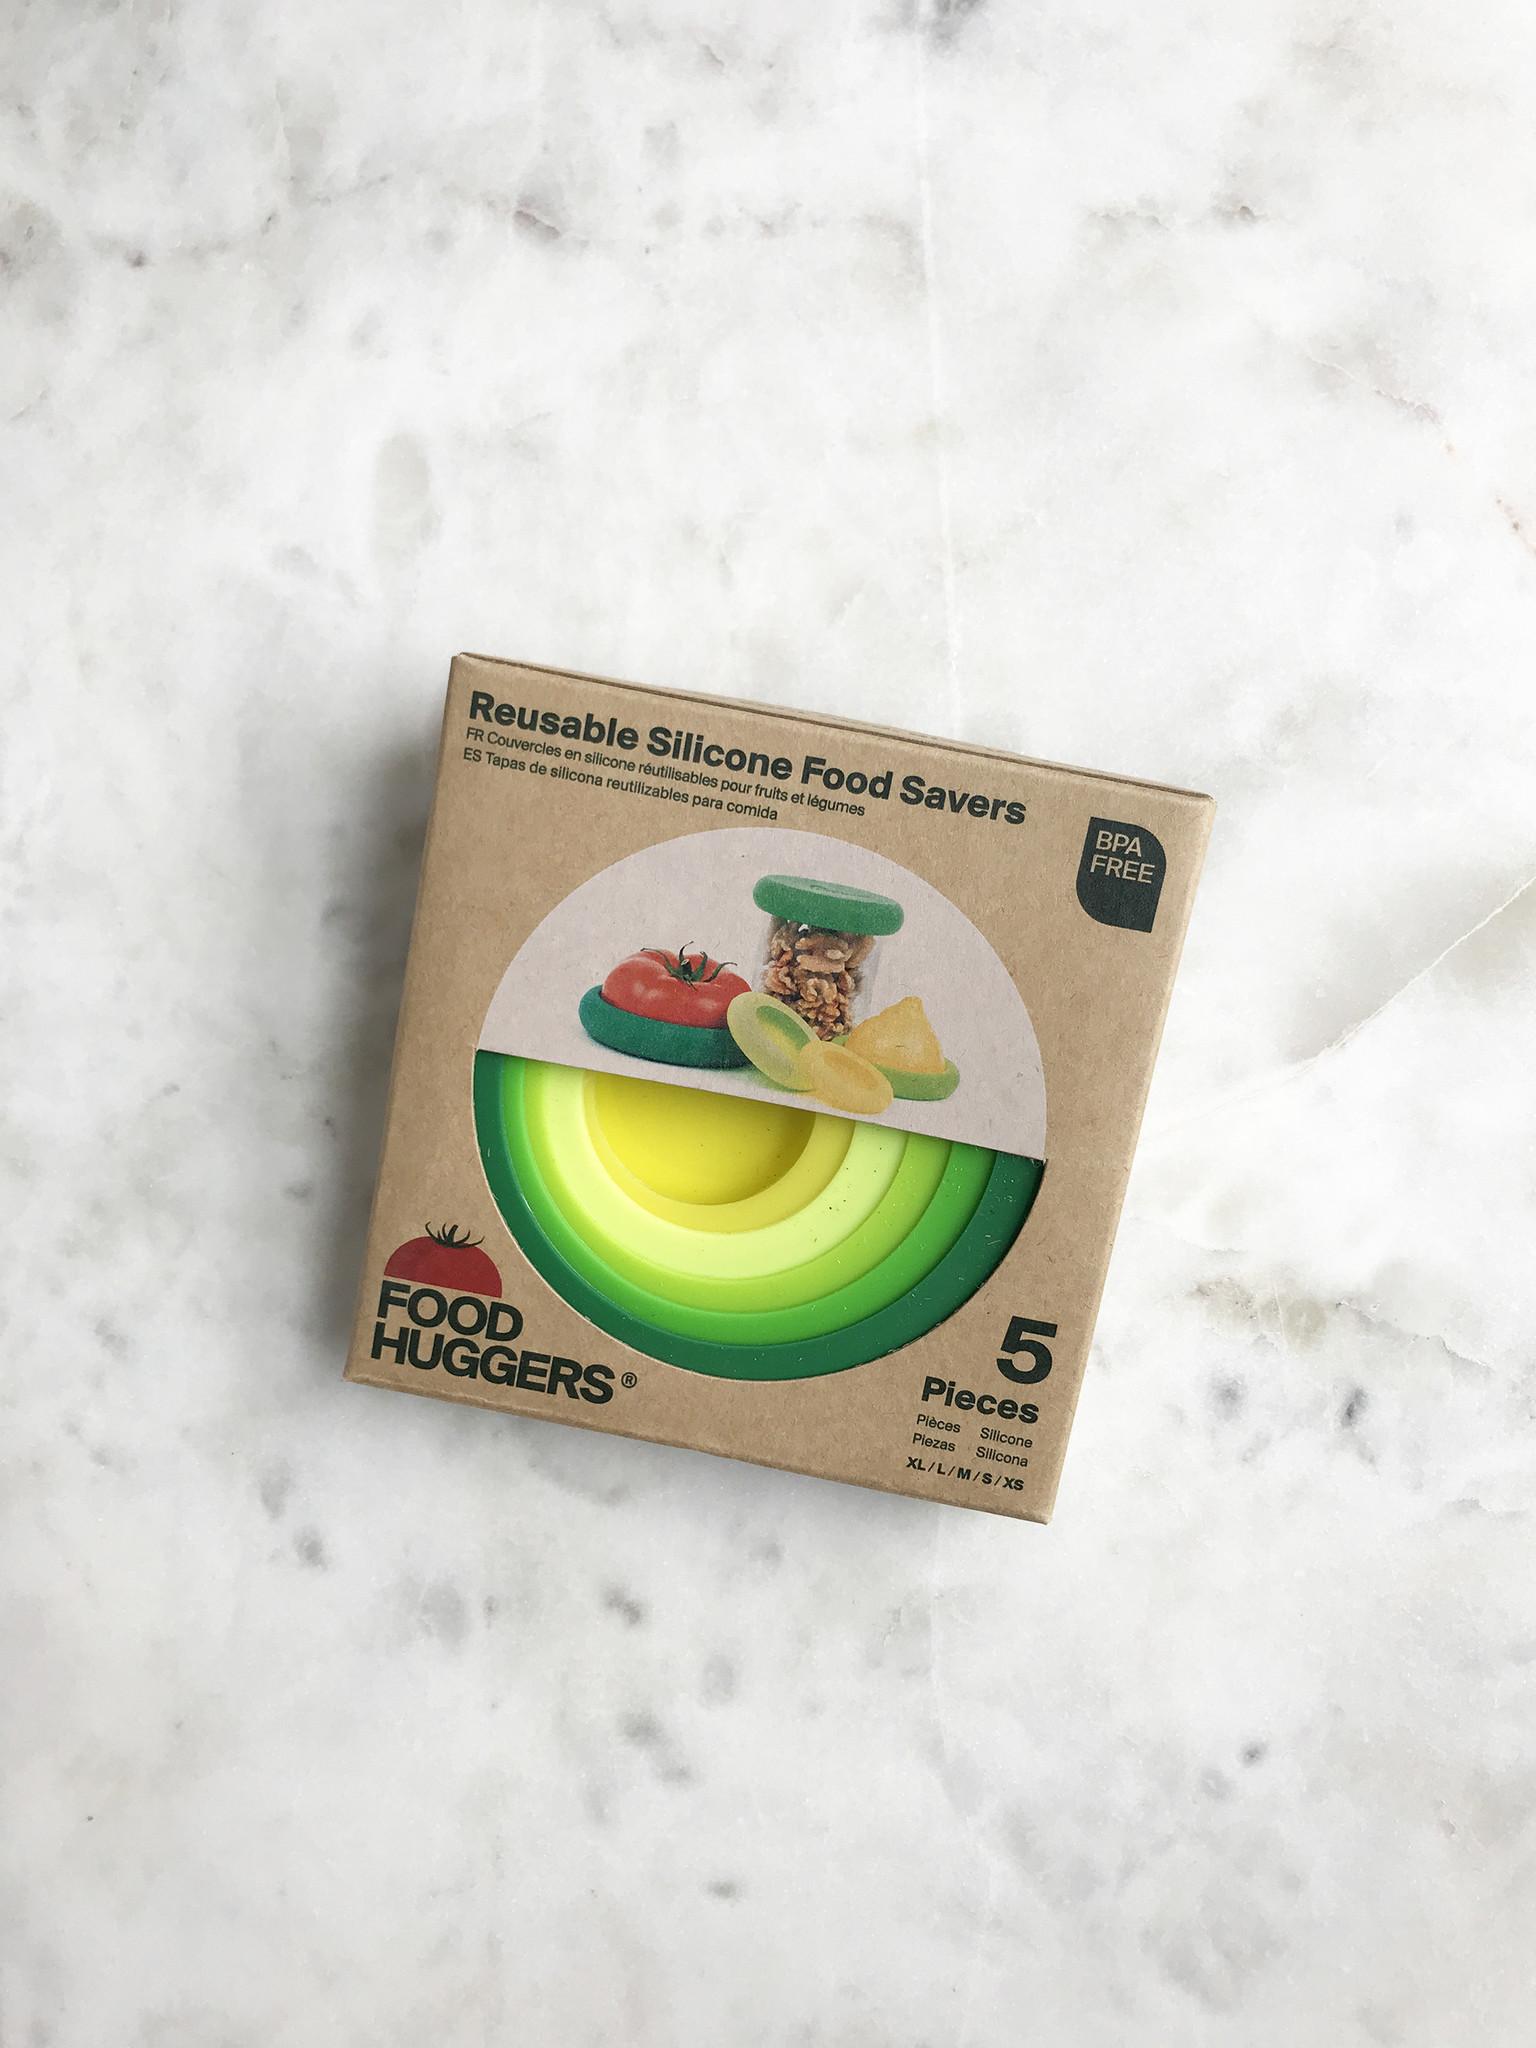 Food Huggers Silicone Food Savers-1